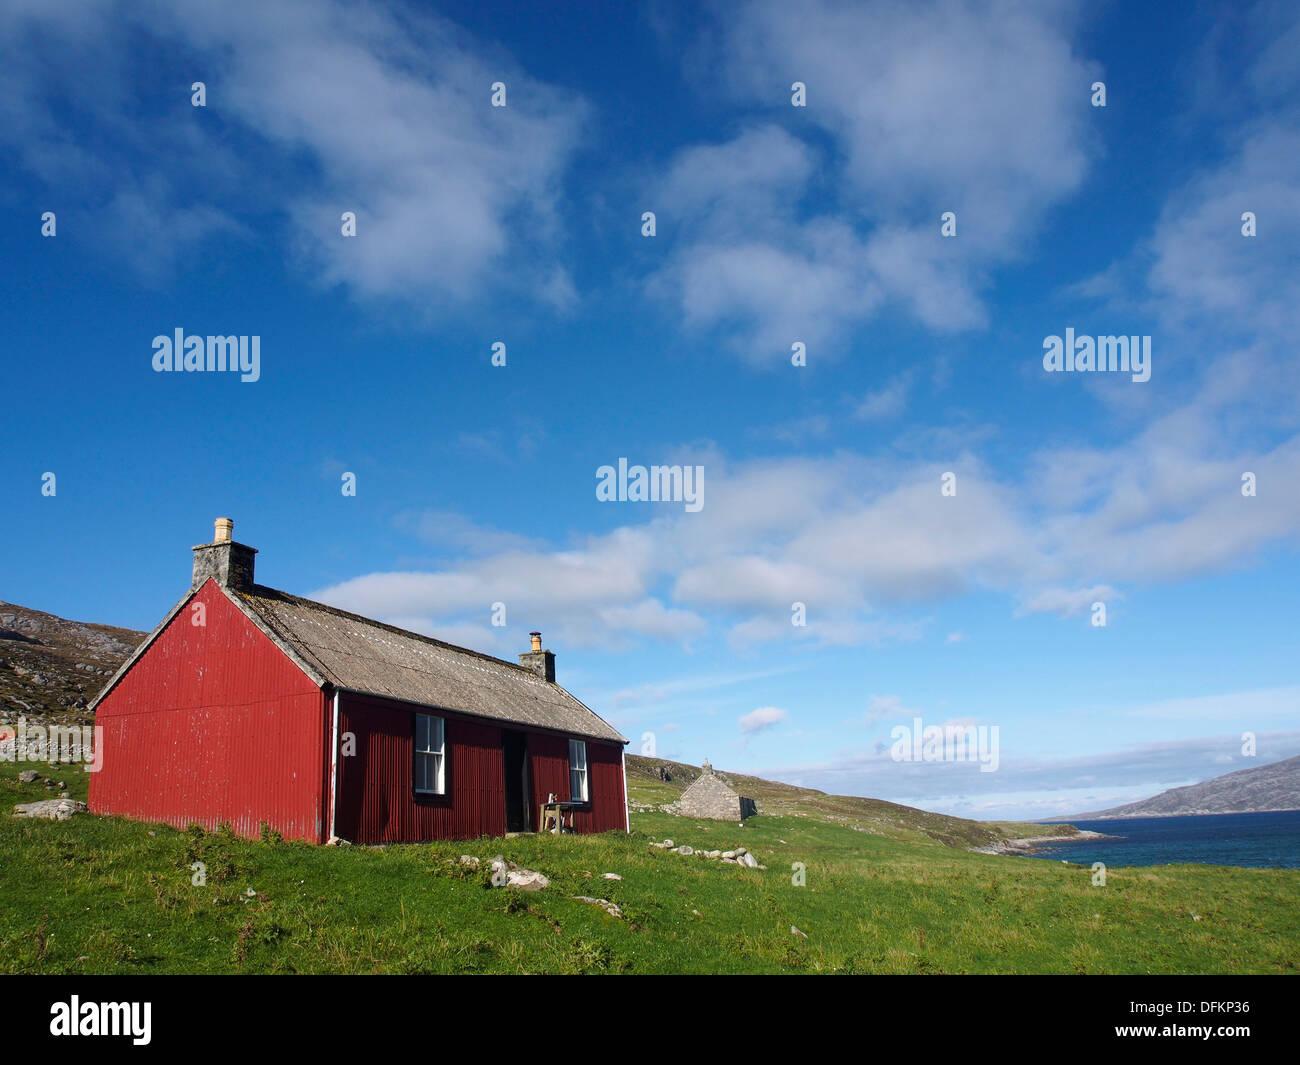 Red house, Scarp, Scotland - Stock Image